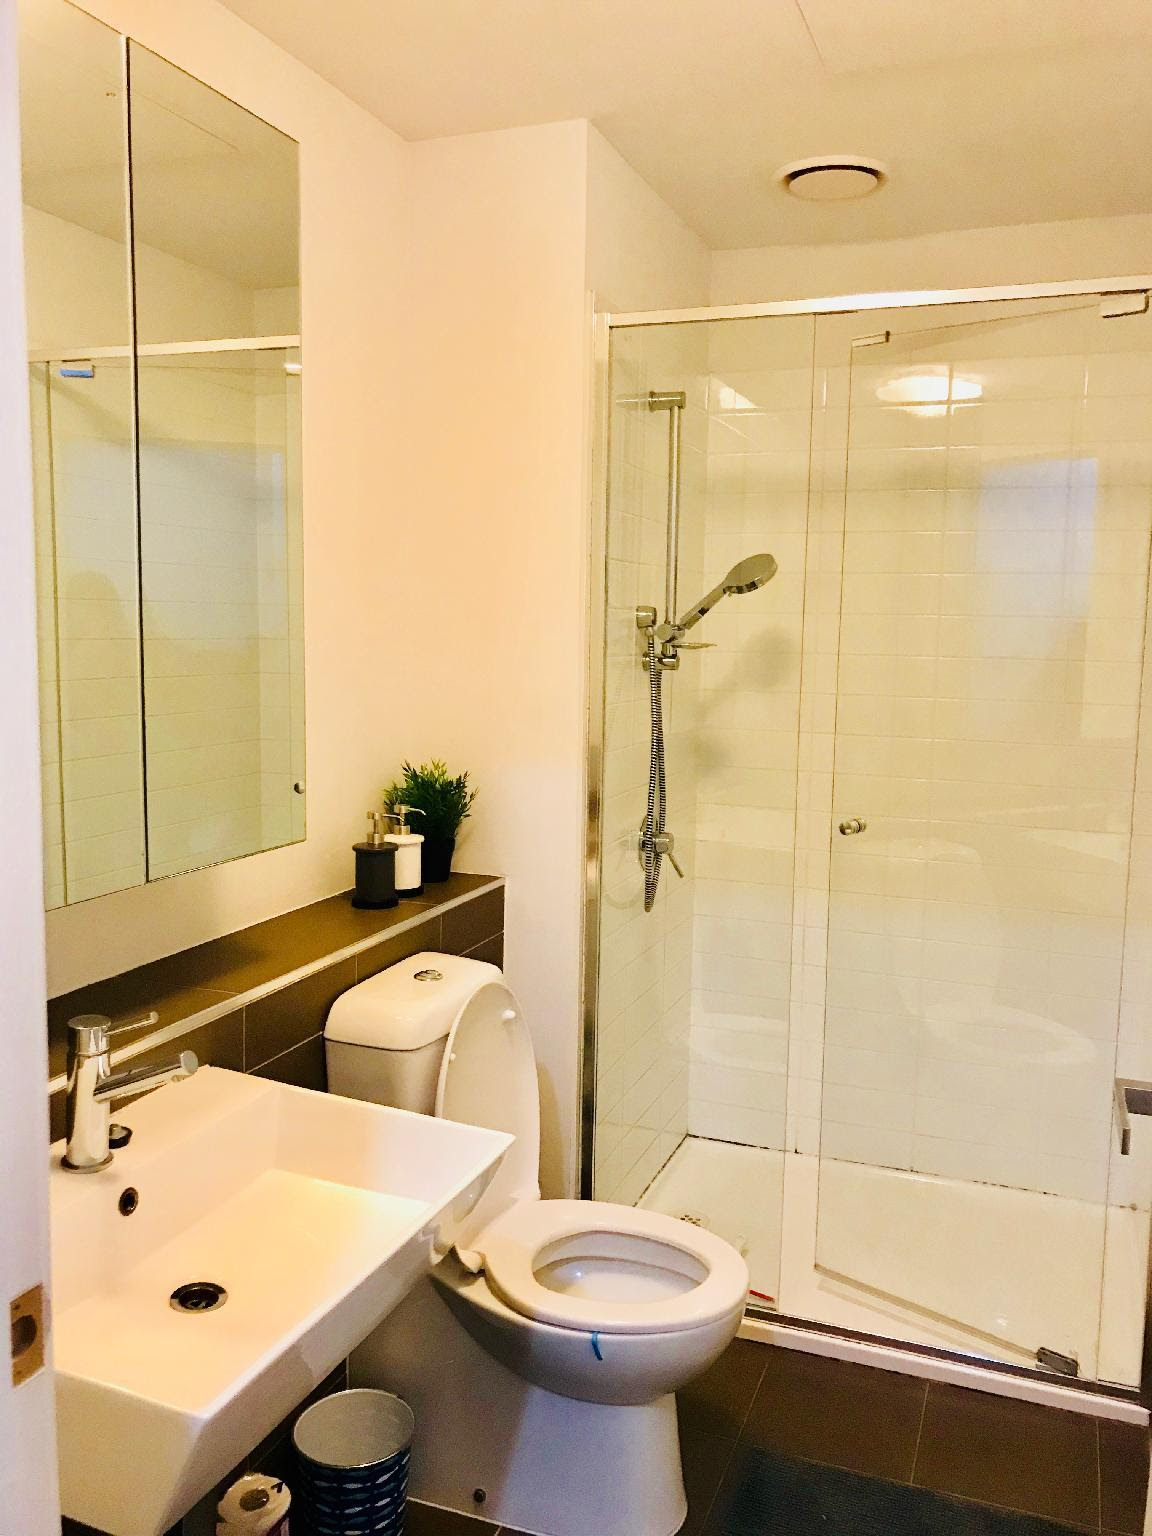 hotel near Melbourne AUSP32-A CBD private room cozy apt free tram zone